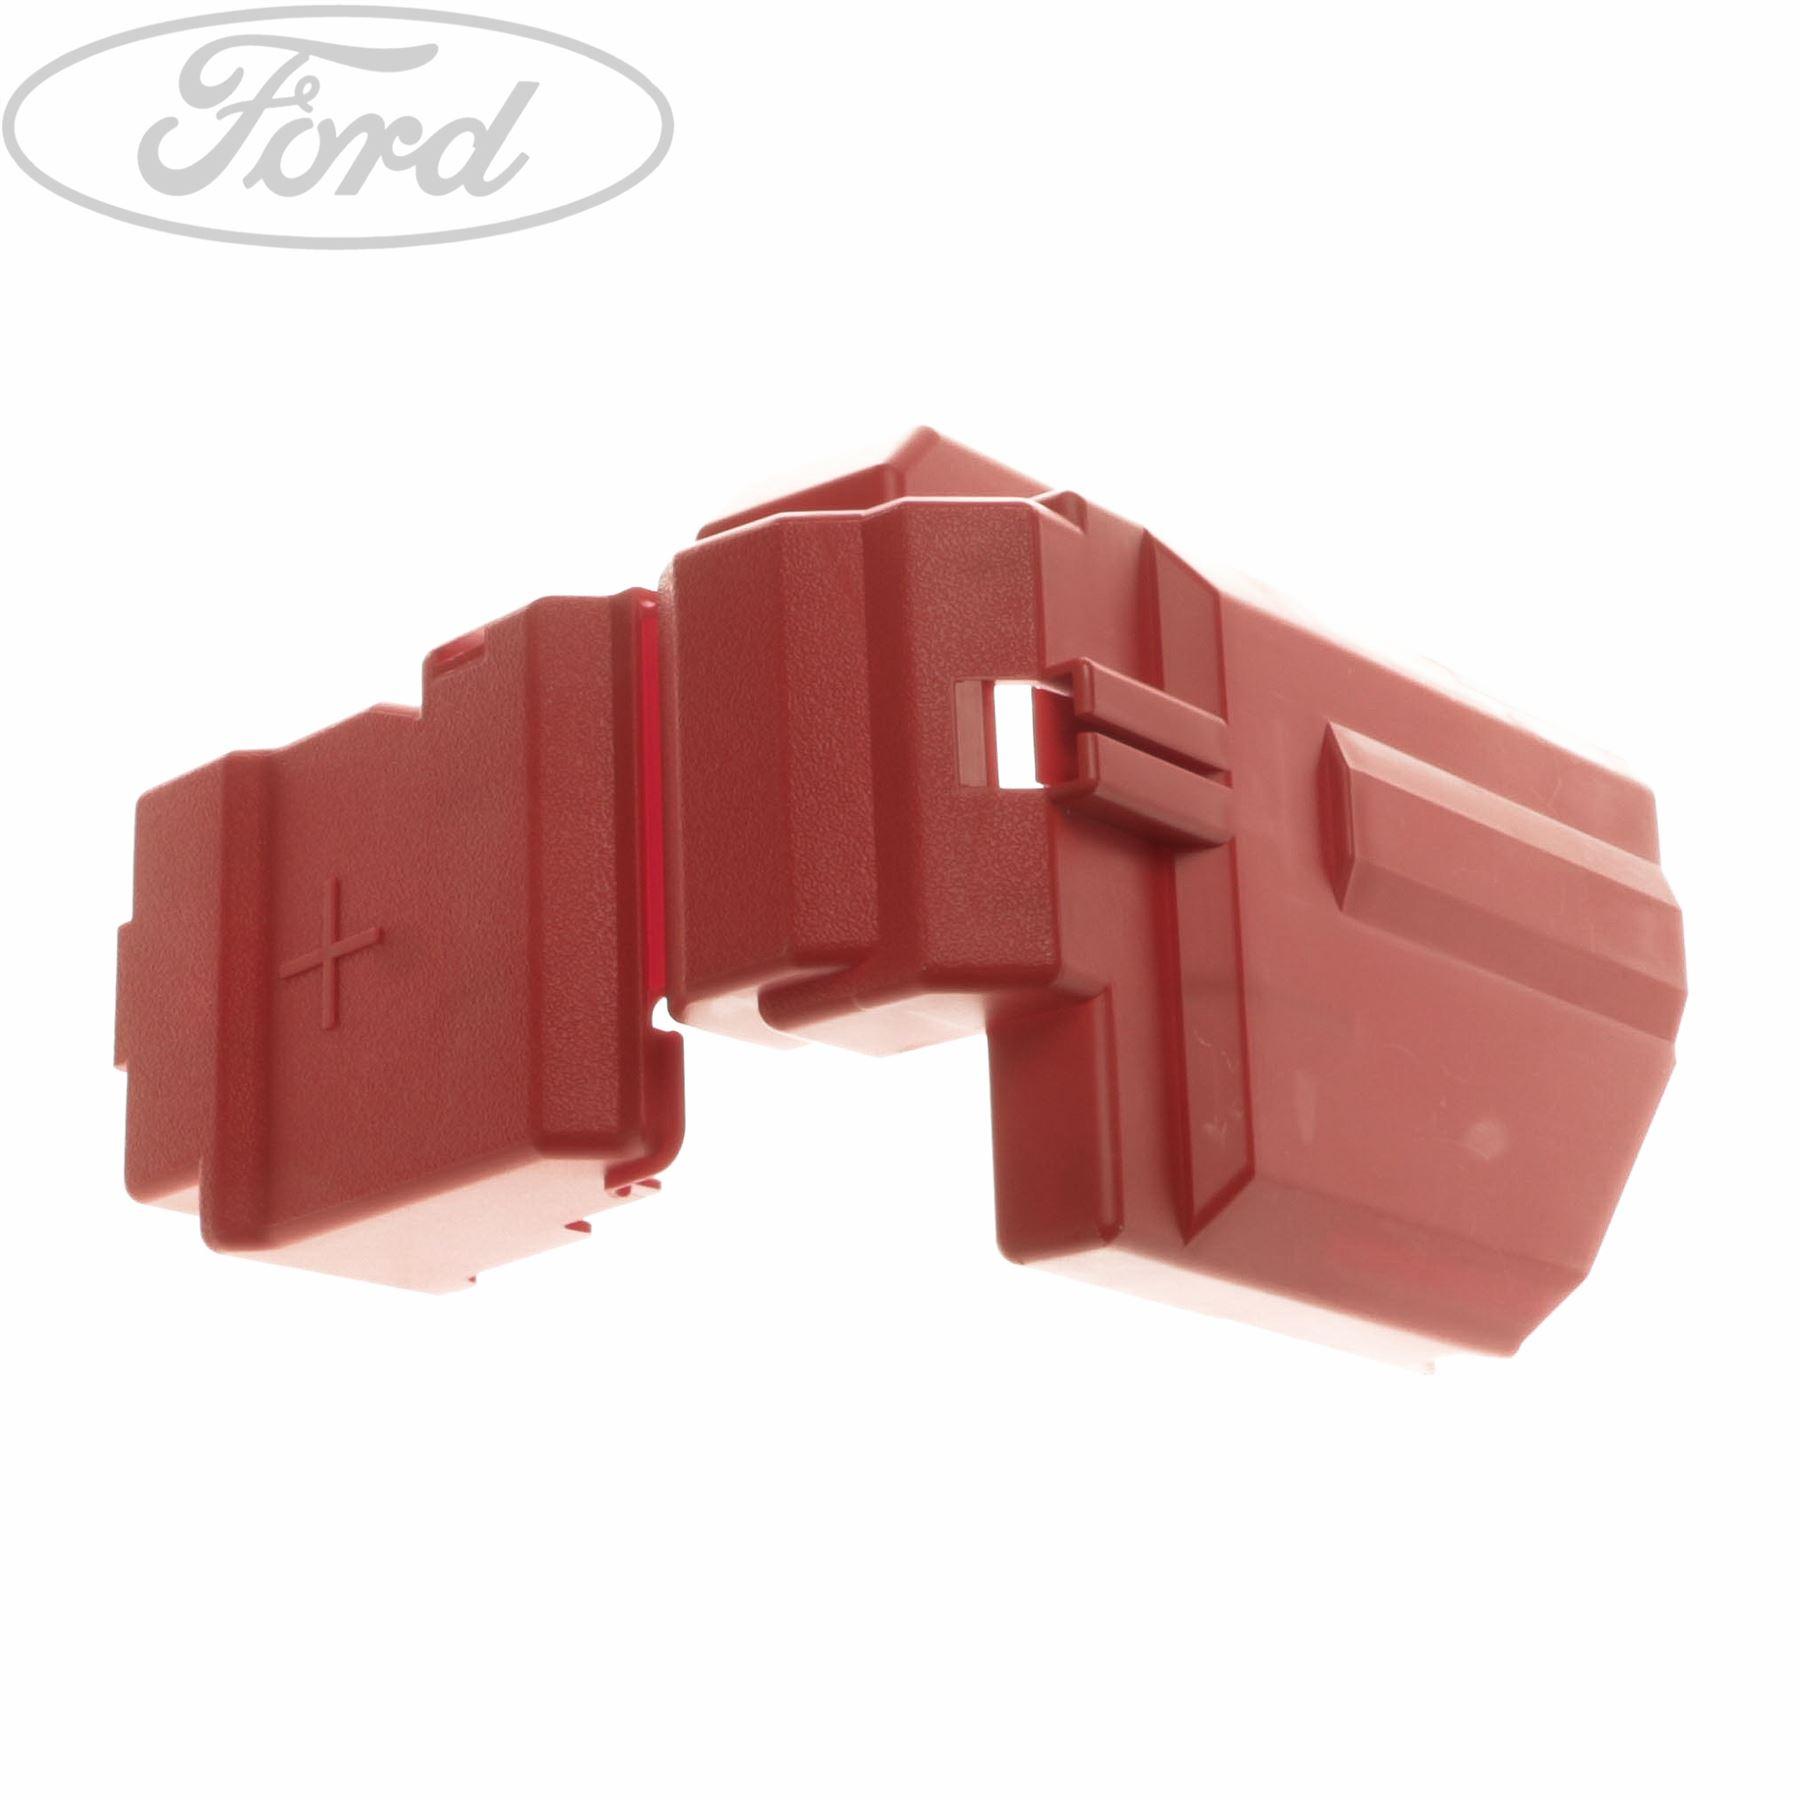 Genuine Ford Fiesta Mk7 Fuse Box Cover 1832217 Ebay